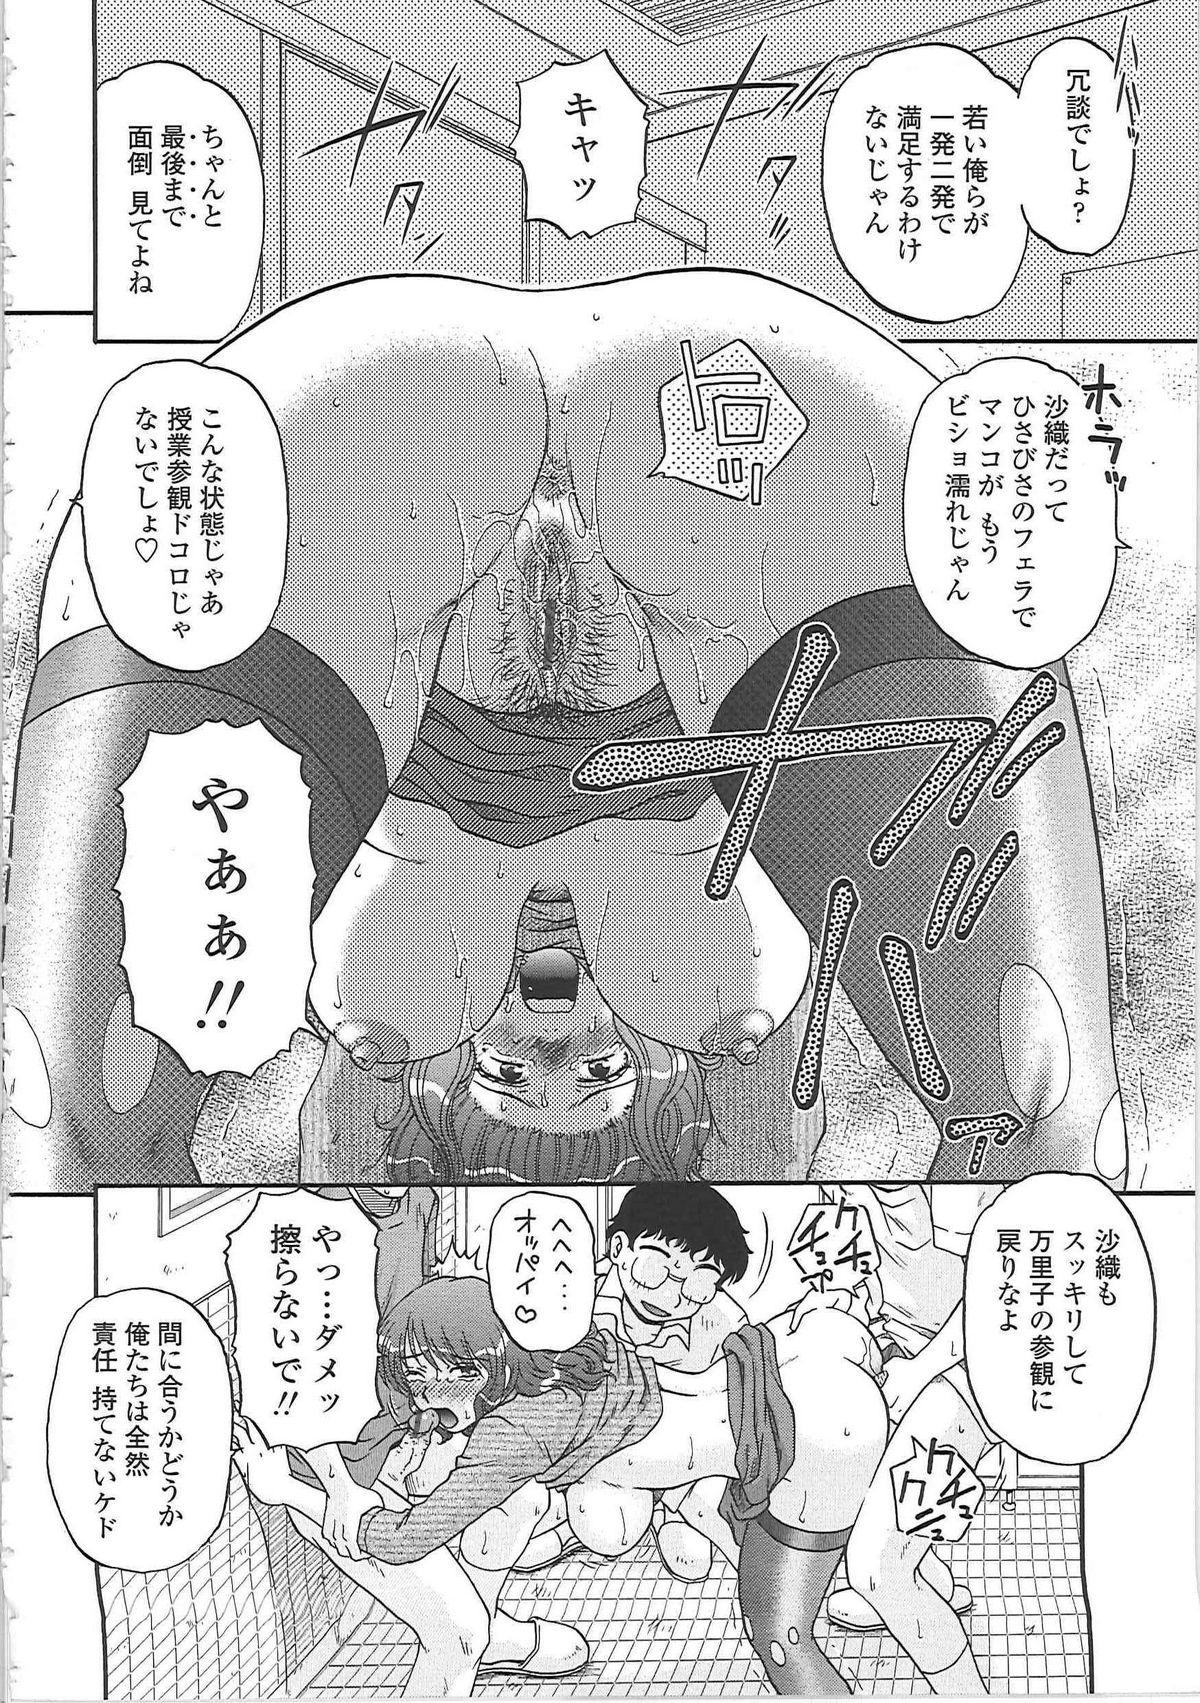 Nikuzuma Tsuushin - Erotic Wife Communication 124